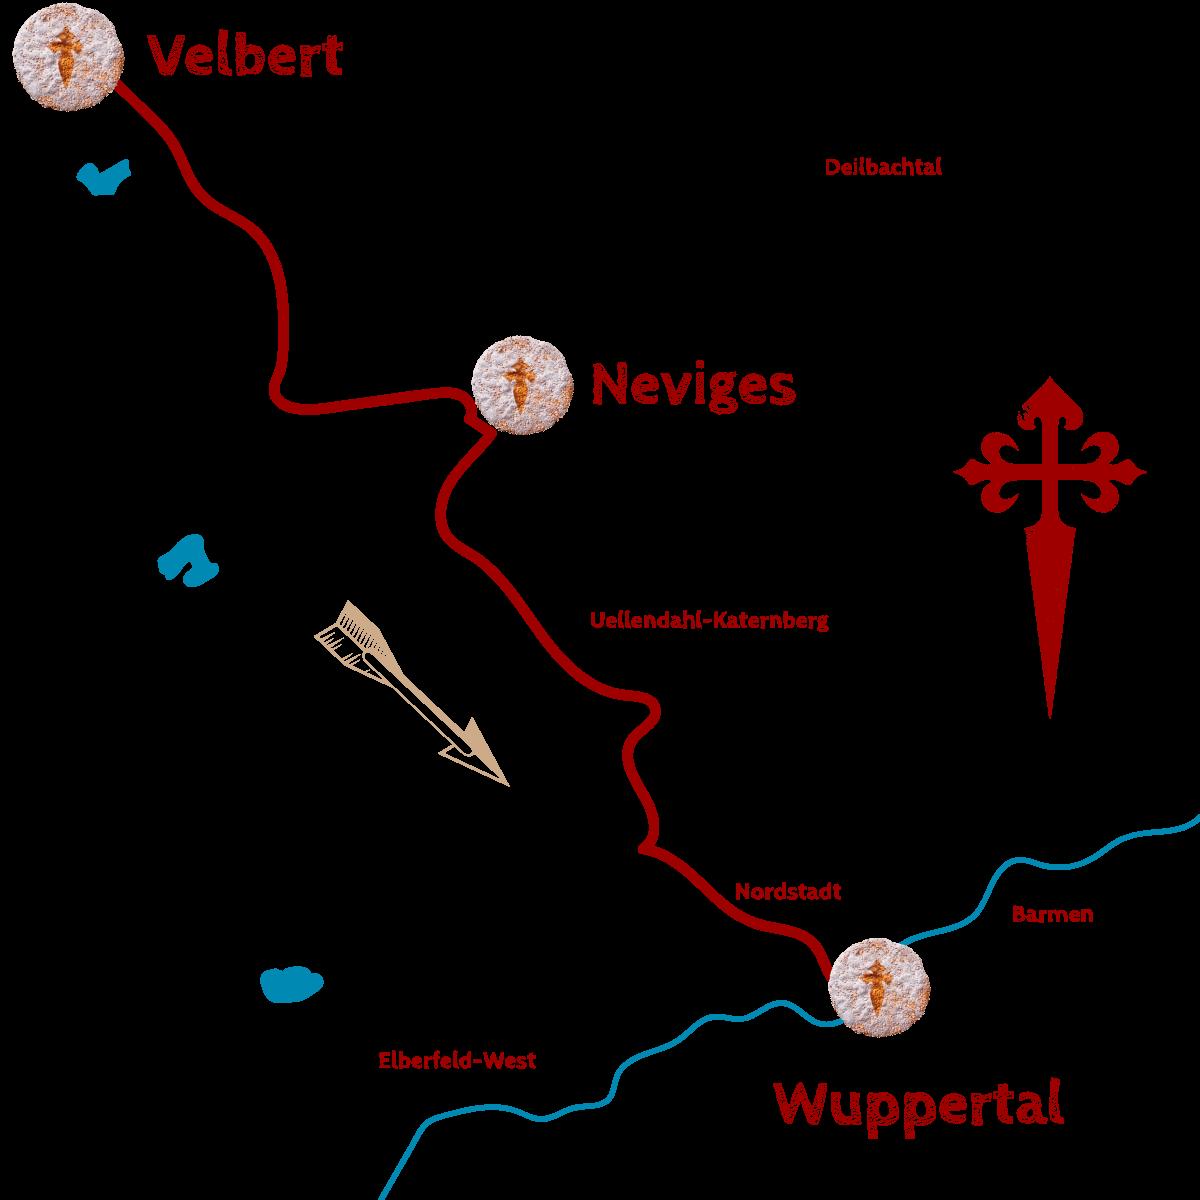 Wegegrafik-St-Elisabeth-Dortmund-22-Oktober-2020